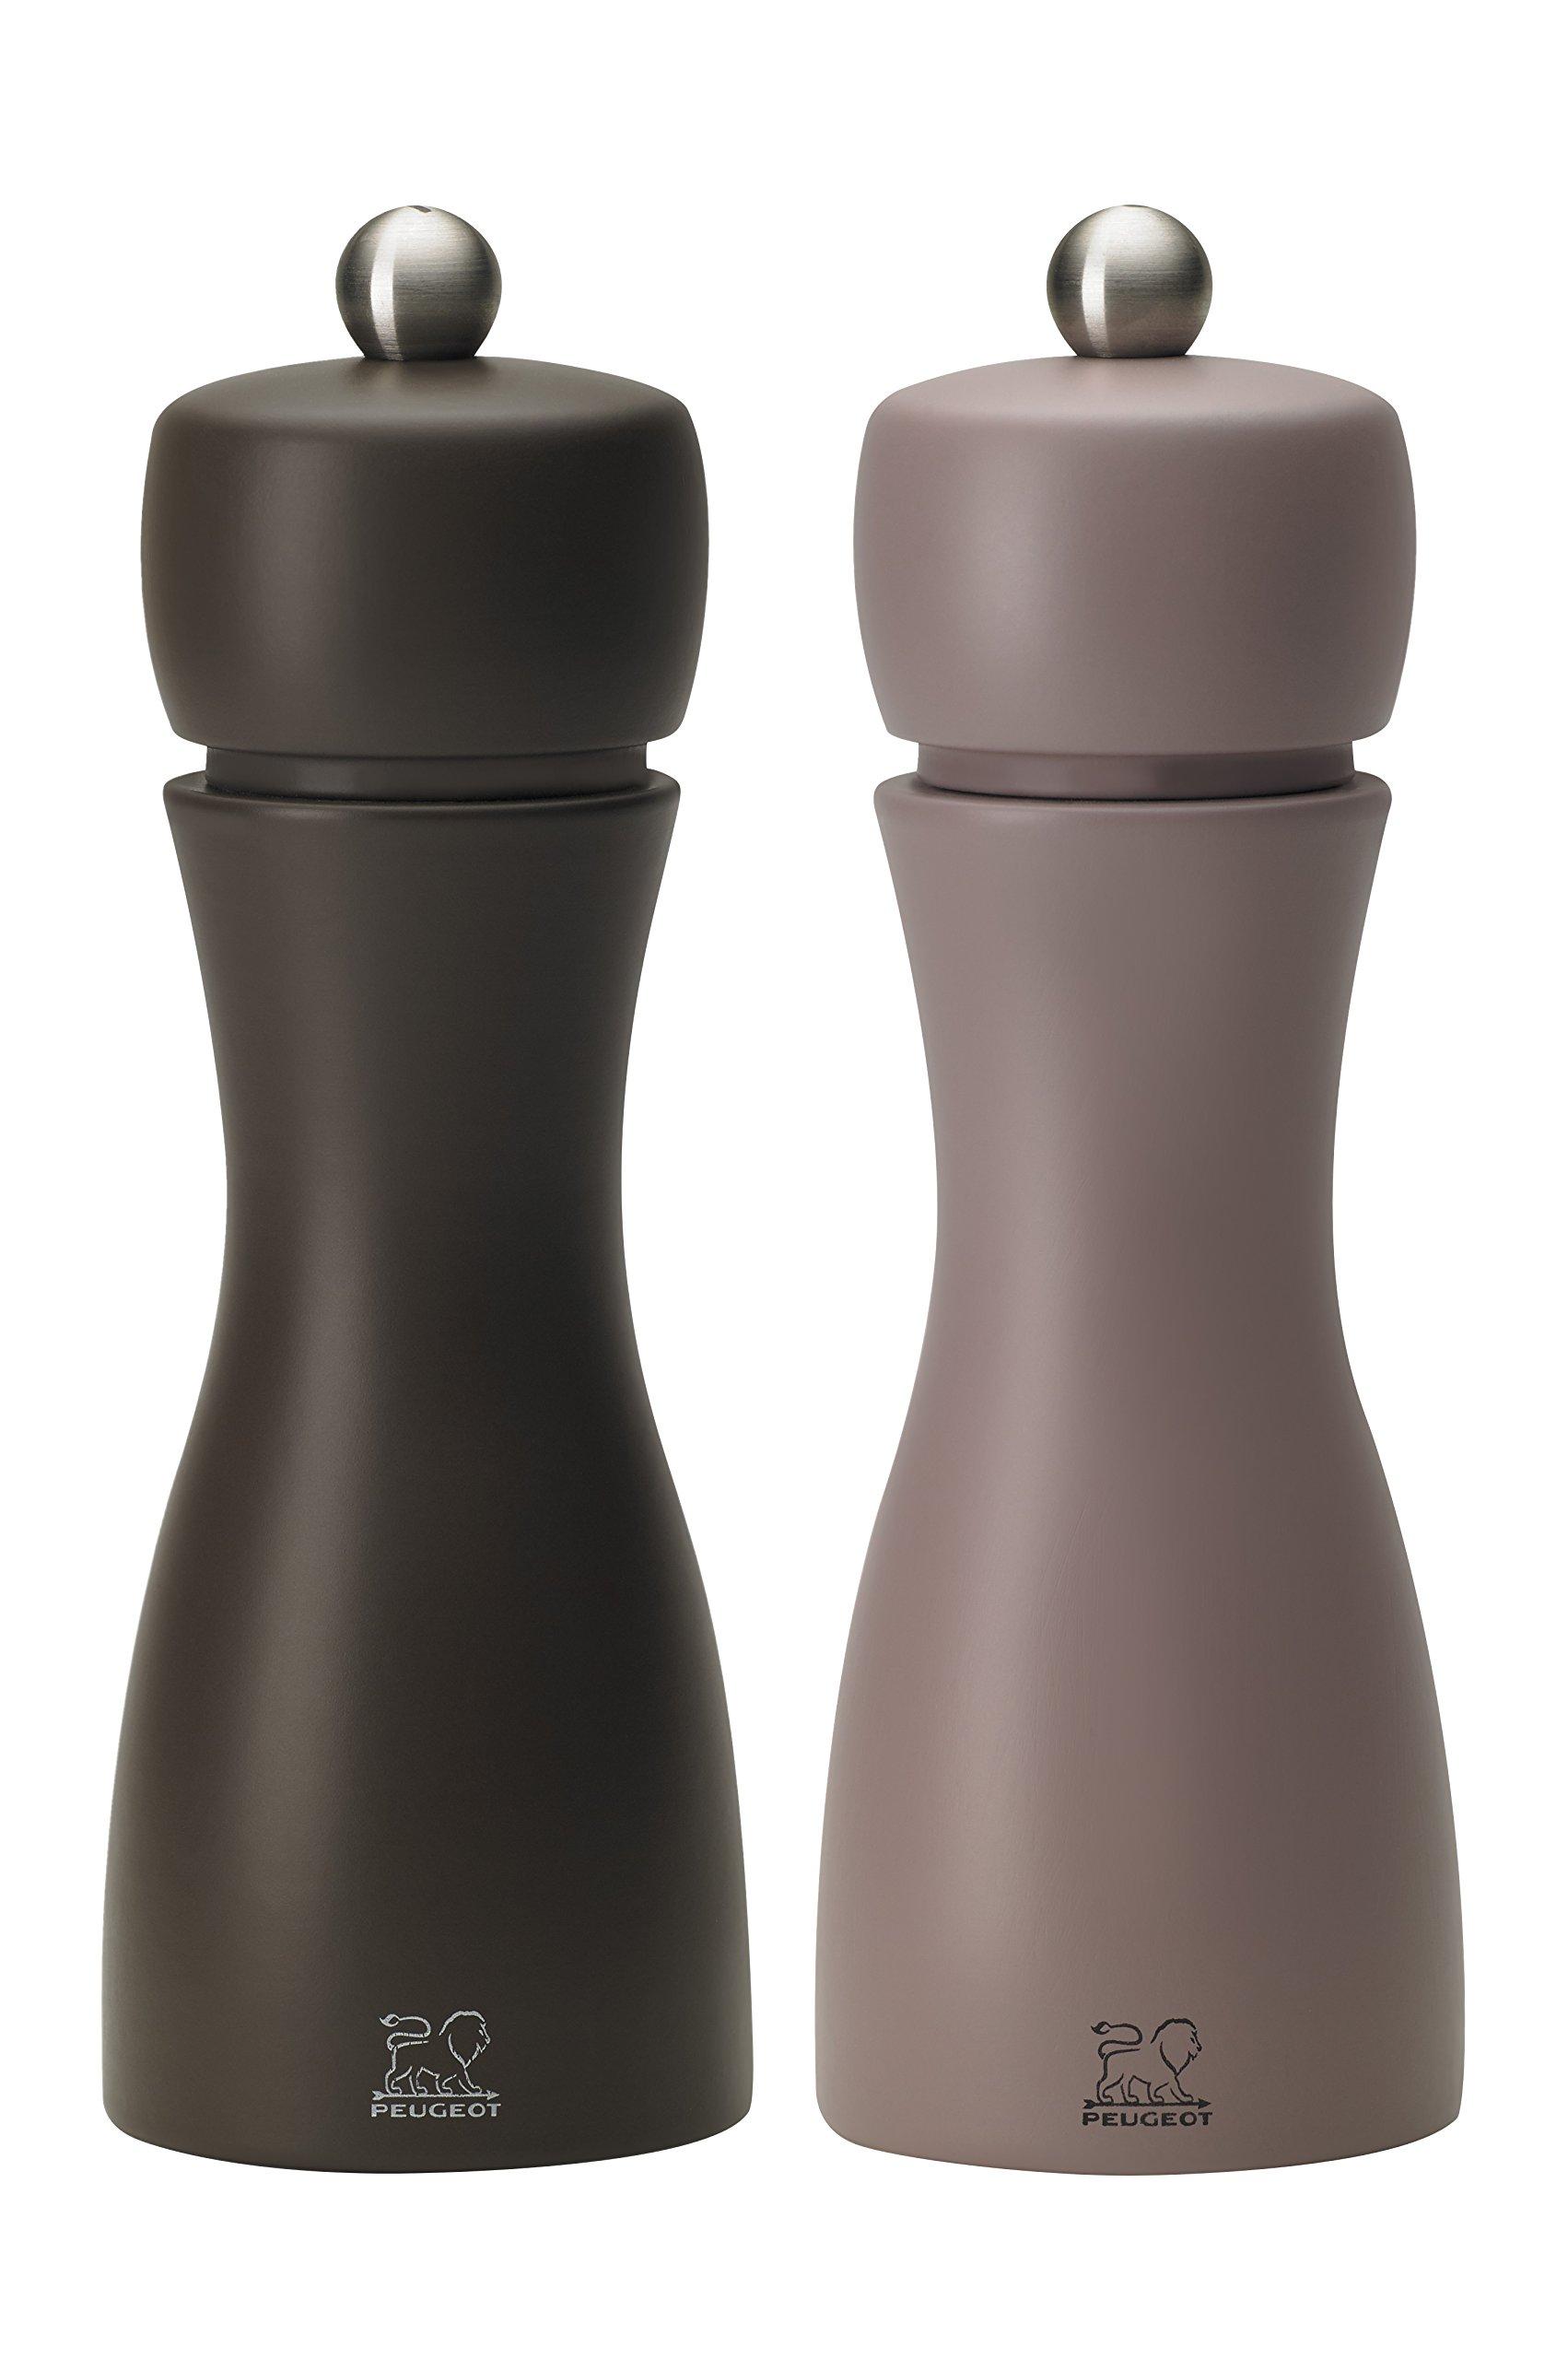 Peugeot Tahiti DUO Winter Salt and Pepper Mills Set 15cm - 6''. 2 Shades of Chestnut Brown